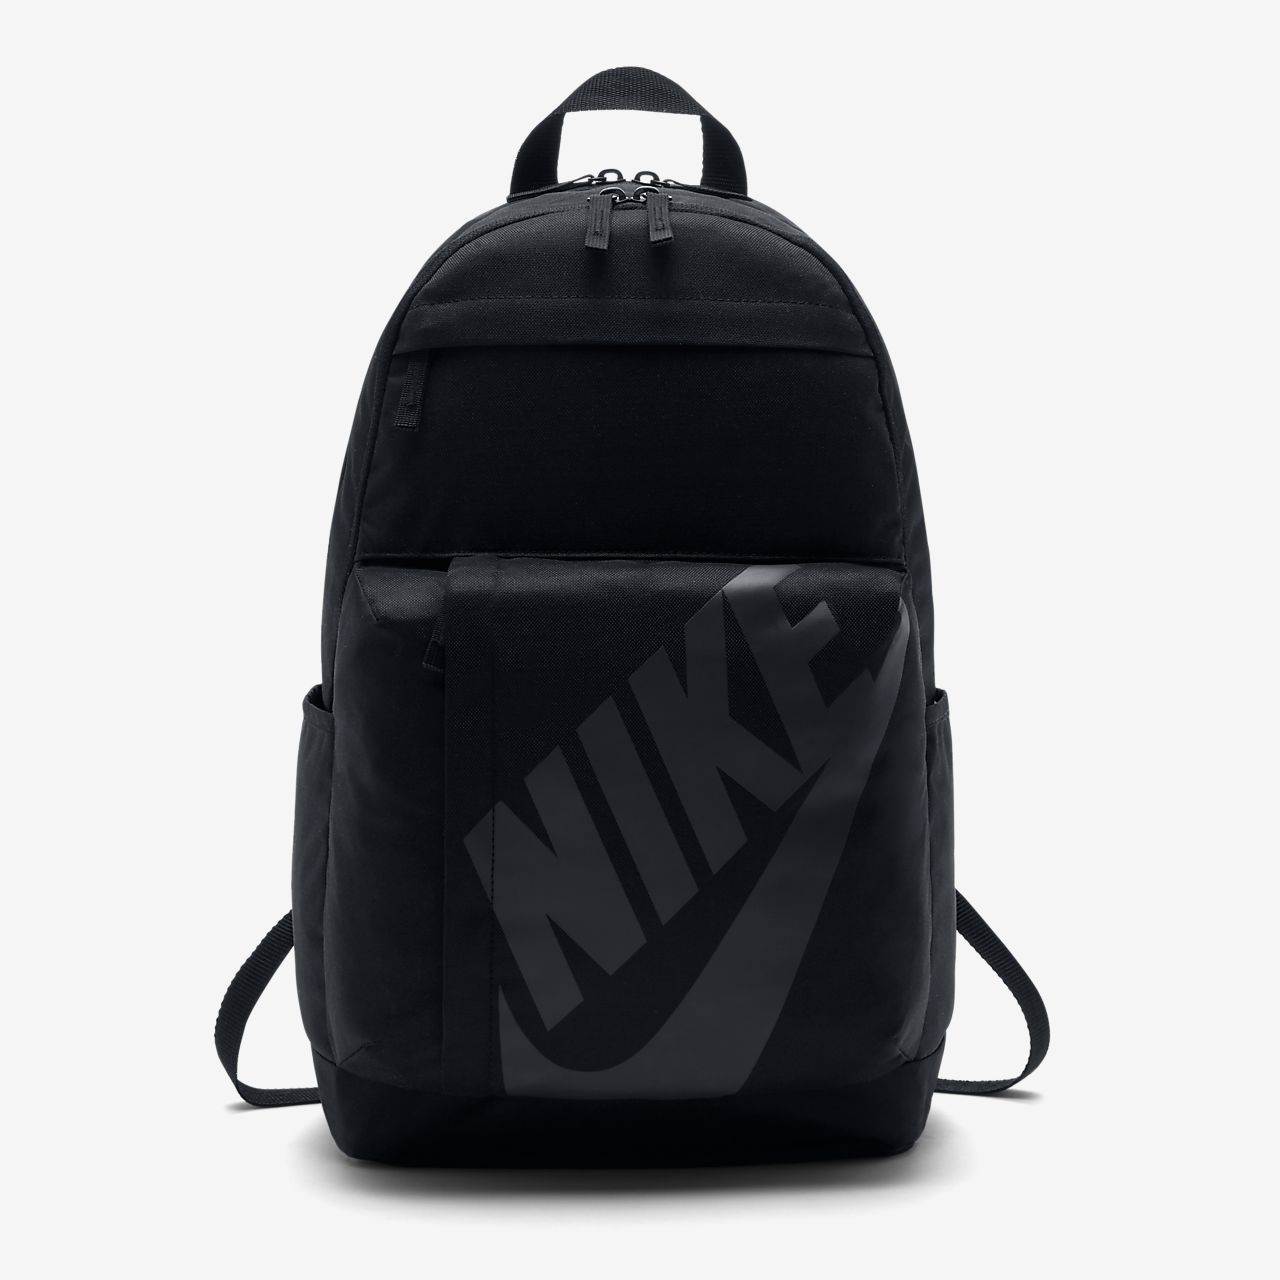 Ryggsäck Nike Sportswear Elemental. Nike.com SE de2d7fc2f2e6e